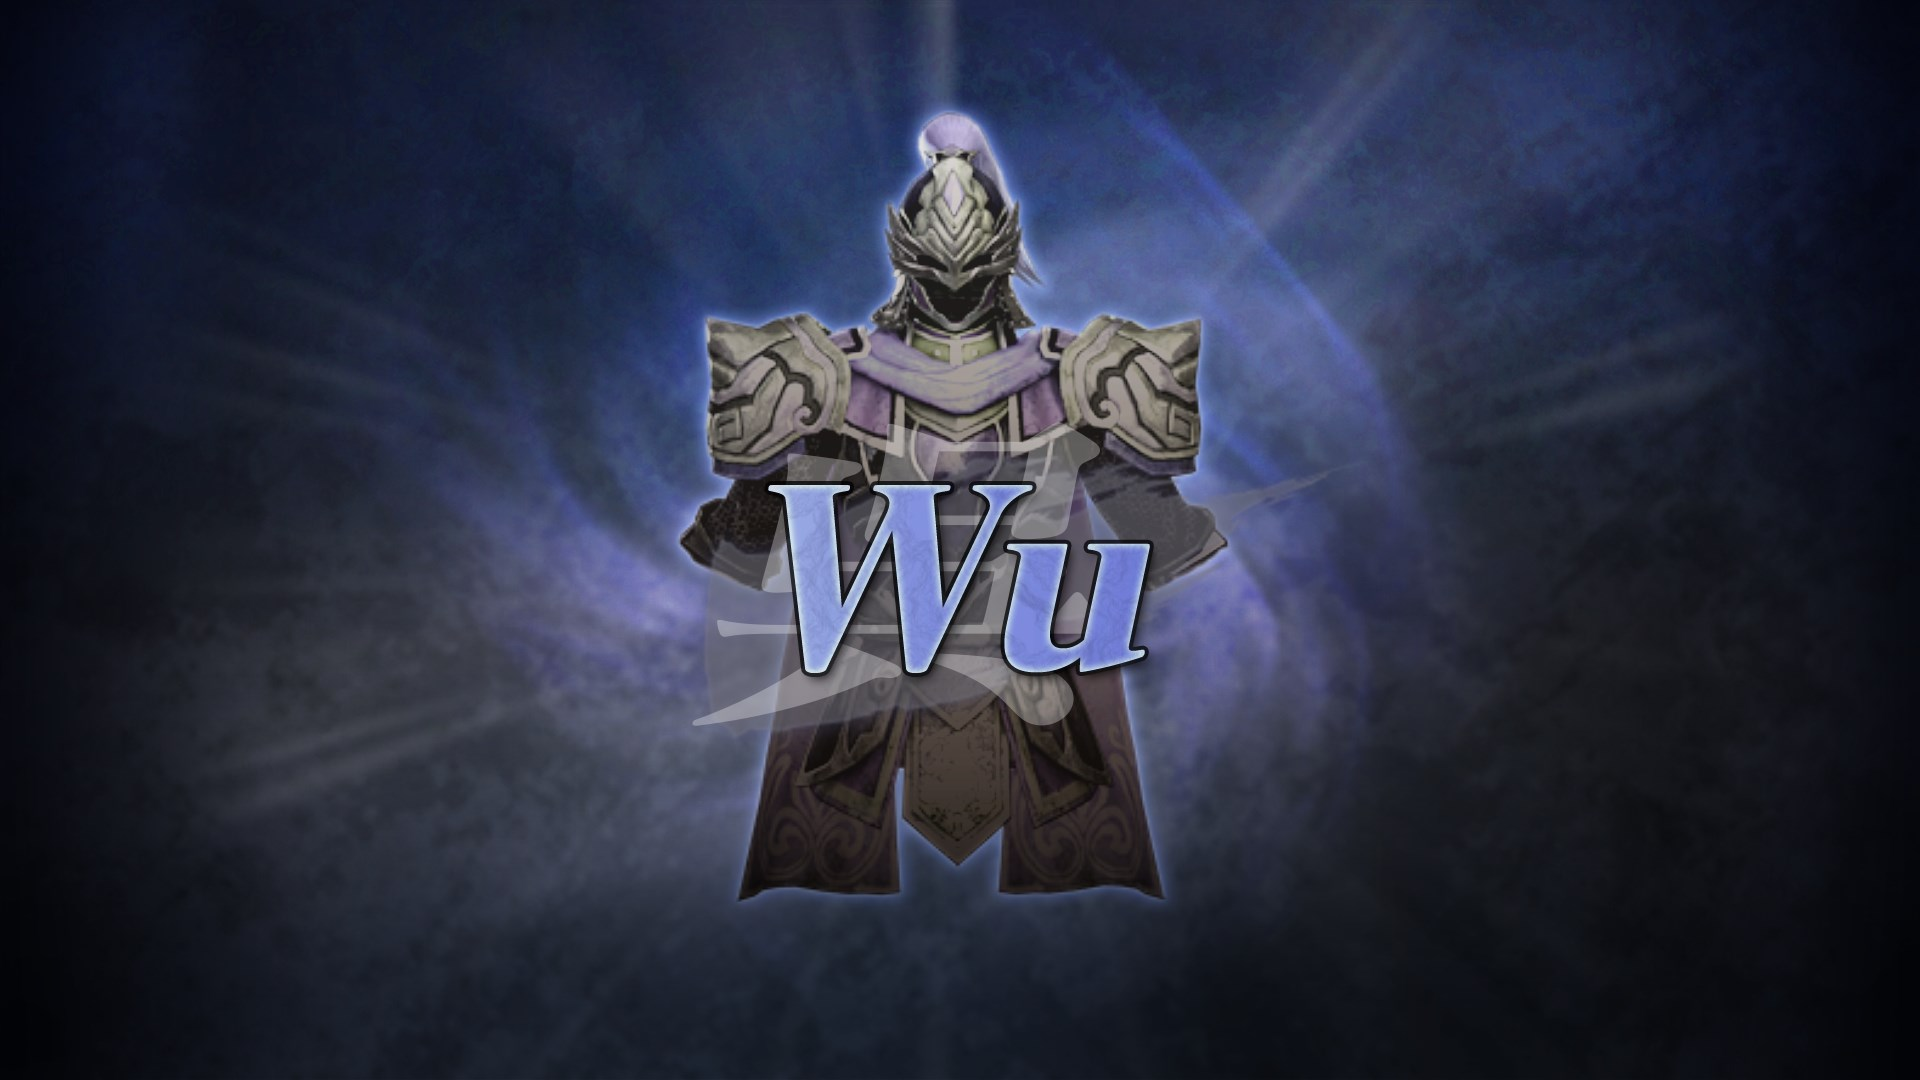 WARRIORS OROCHI 3 Ultimate DWSF COSTUME - WU